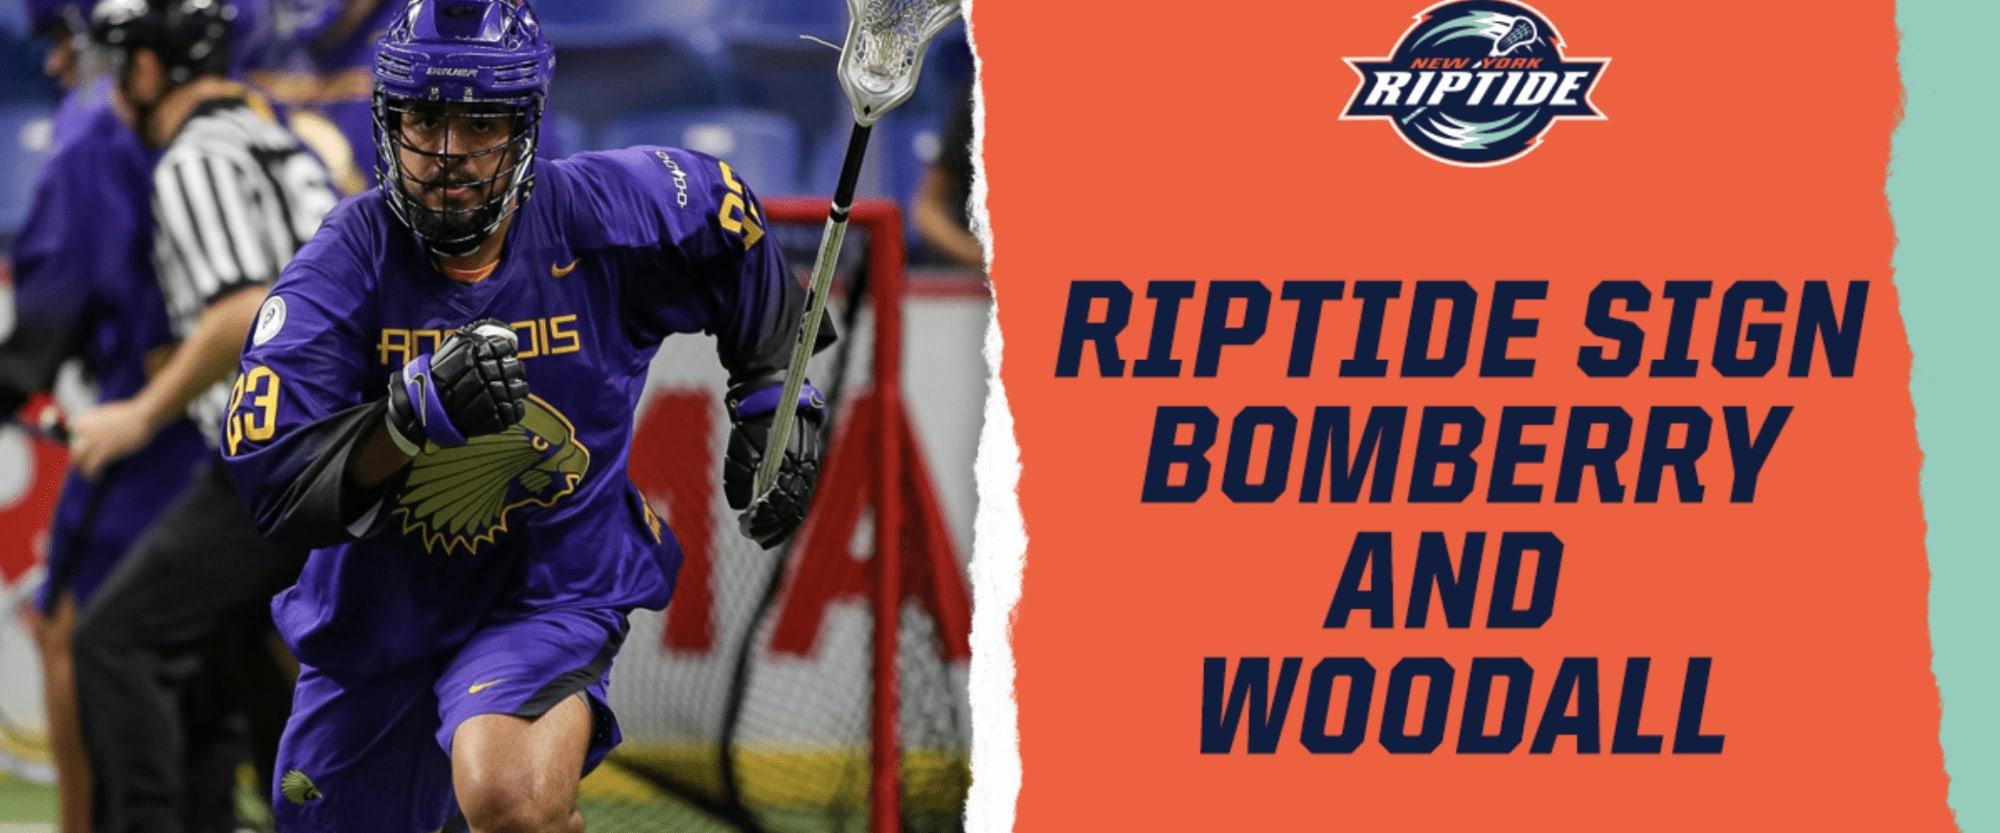 tyson bomberry nll national lacrosse league new york riptide